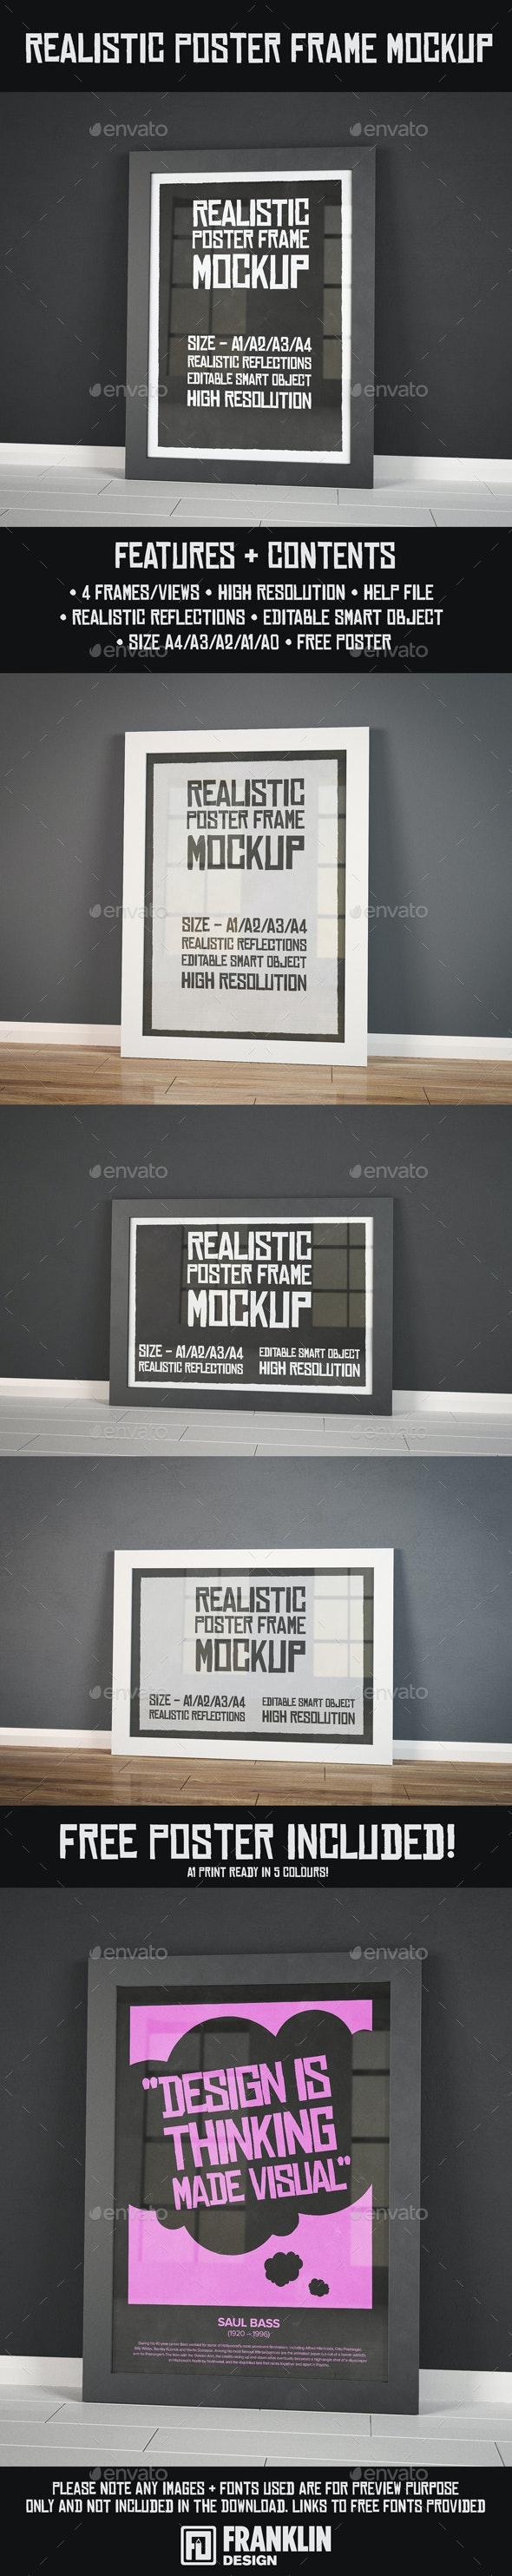 Realistic Poster Frame Mockup - Product Mock-Ups Graphics